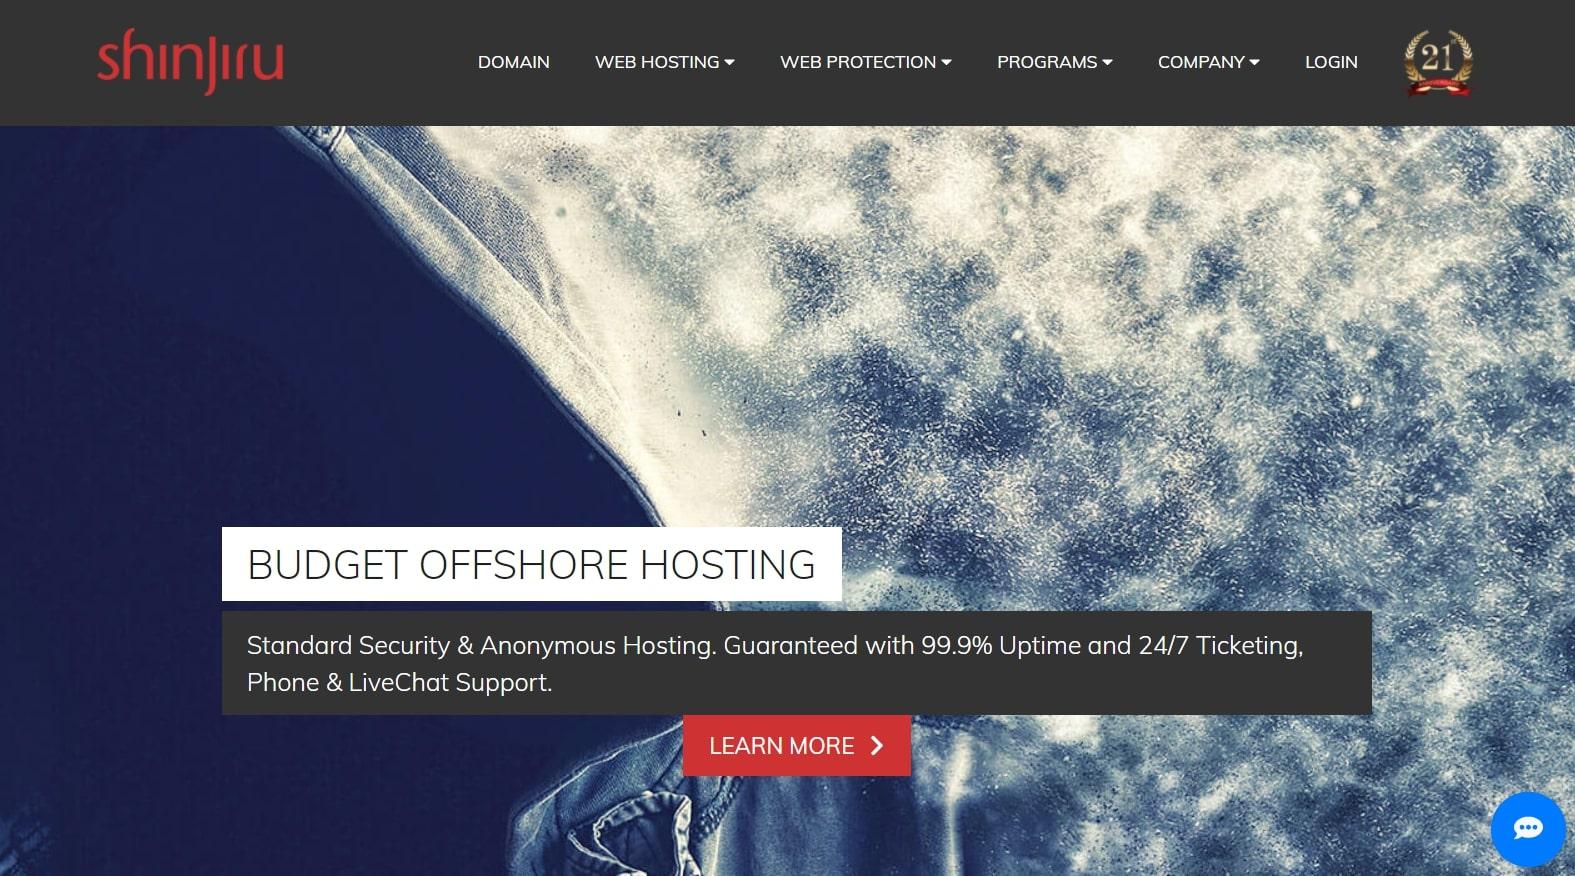 Shinjiru's webpage for budget offshore hosting